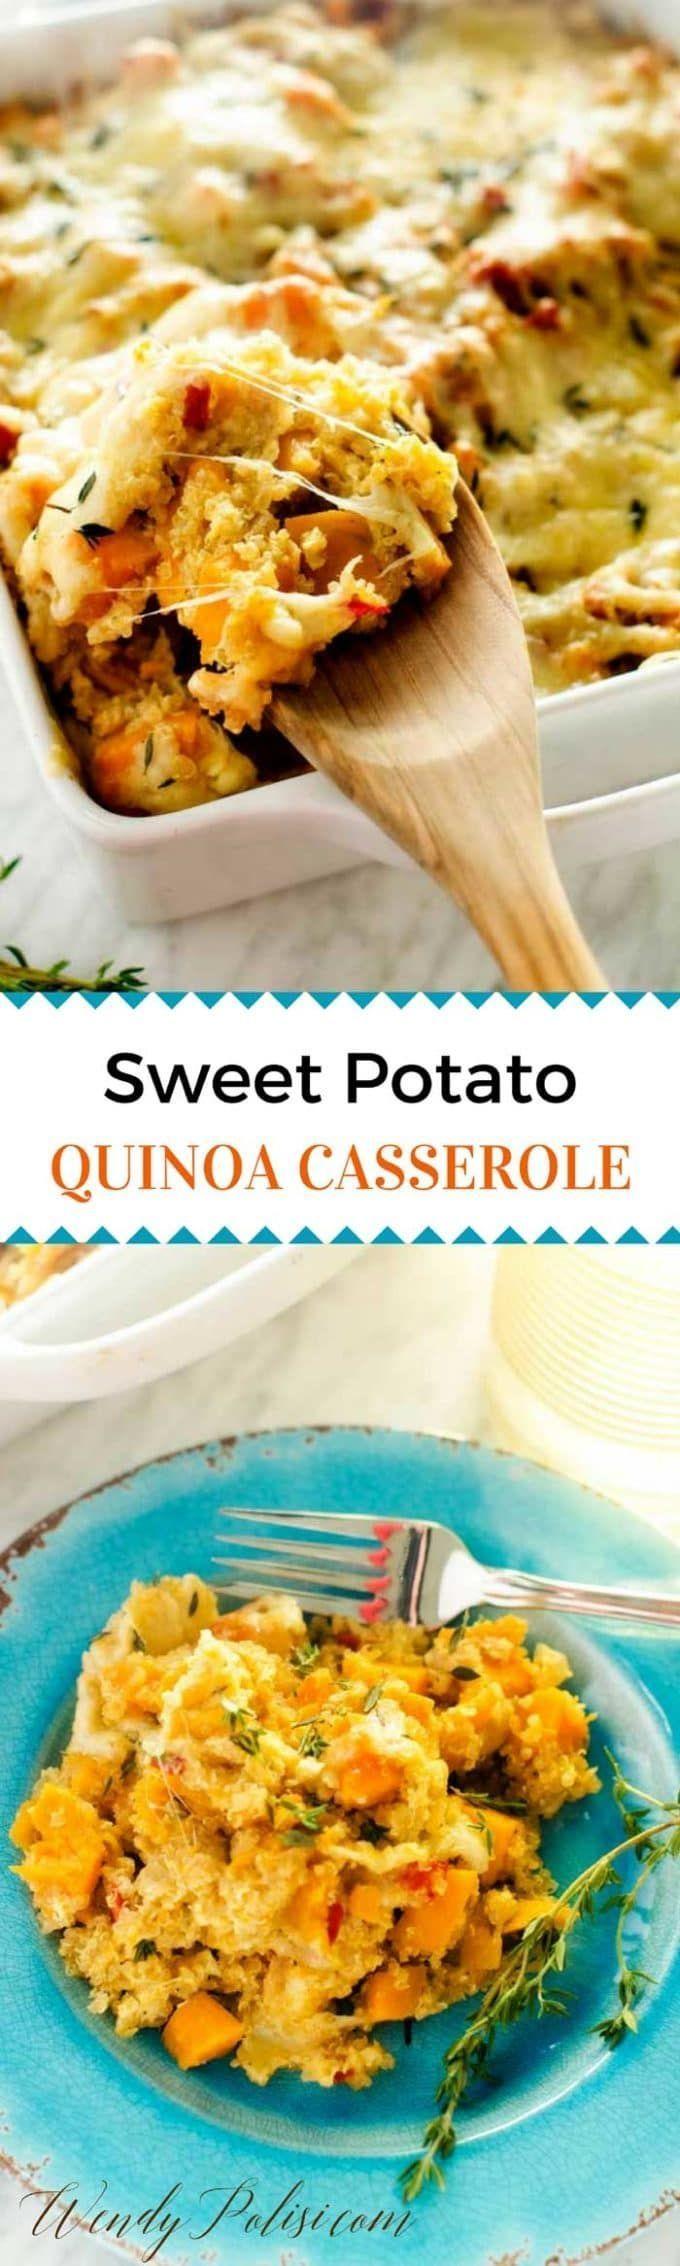 Sweet Potato Quinoa Casserole - This Sweet Potato Quinoa Casserole is the perfect one dish meal!  Gluten Free, Vegetarian, Vegan Option #BrightBites via @wendypolisi